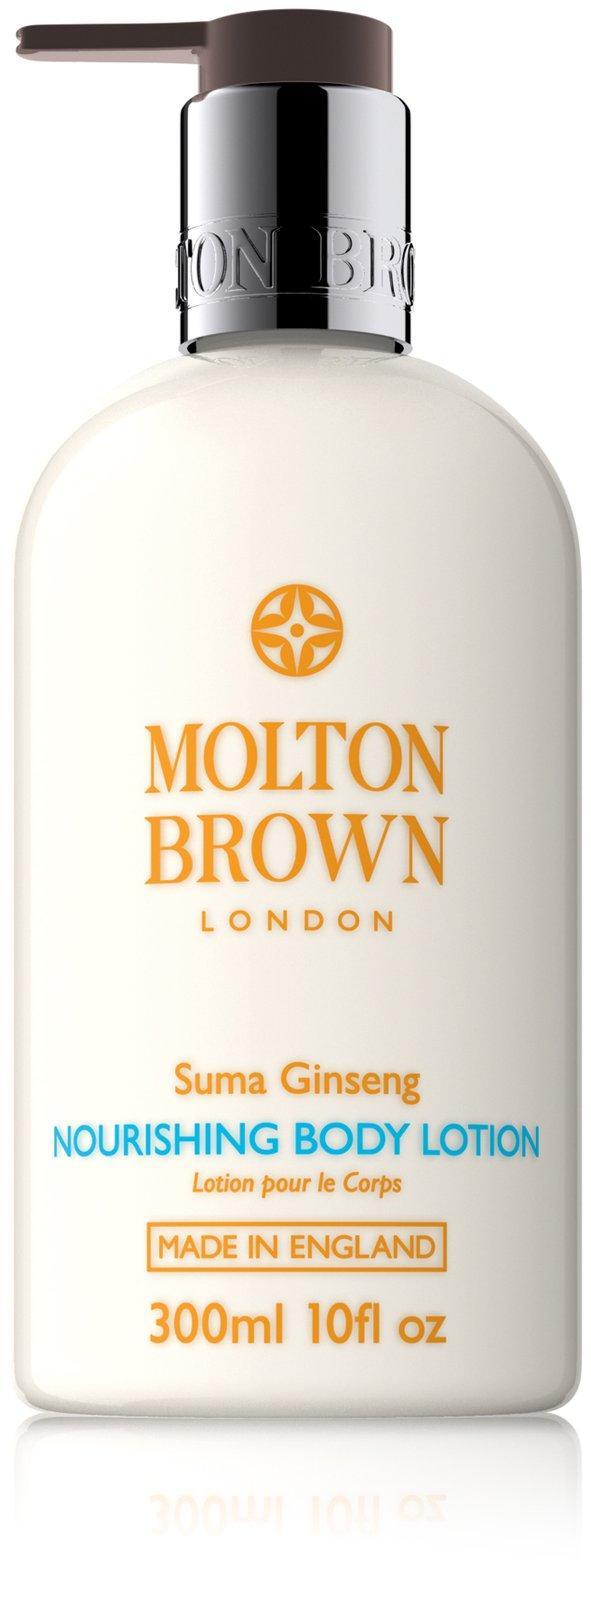 Molton Brown Suma Ginseng Body Lotion